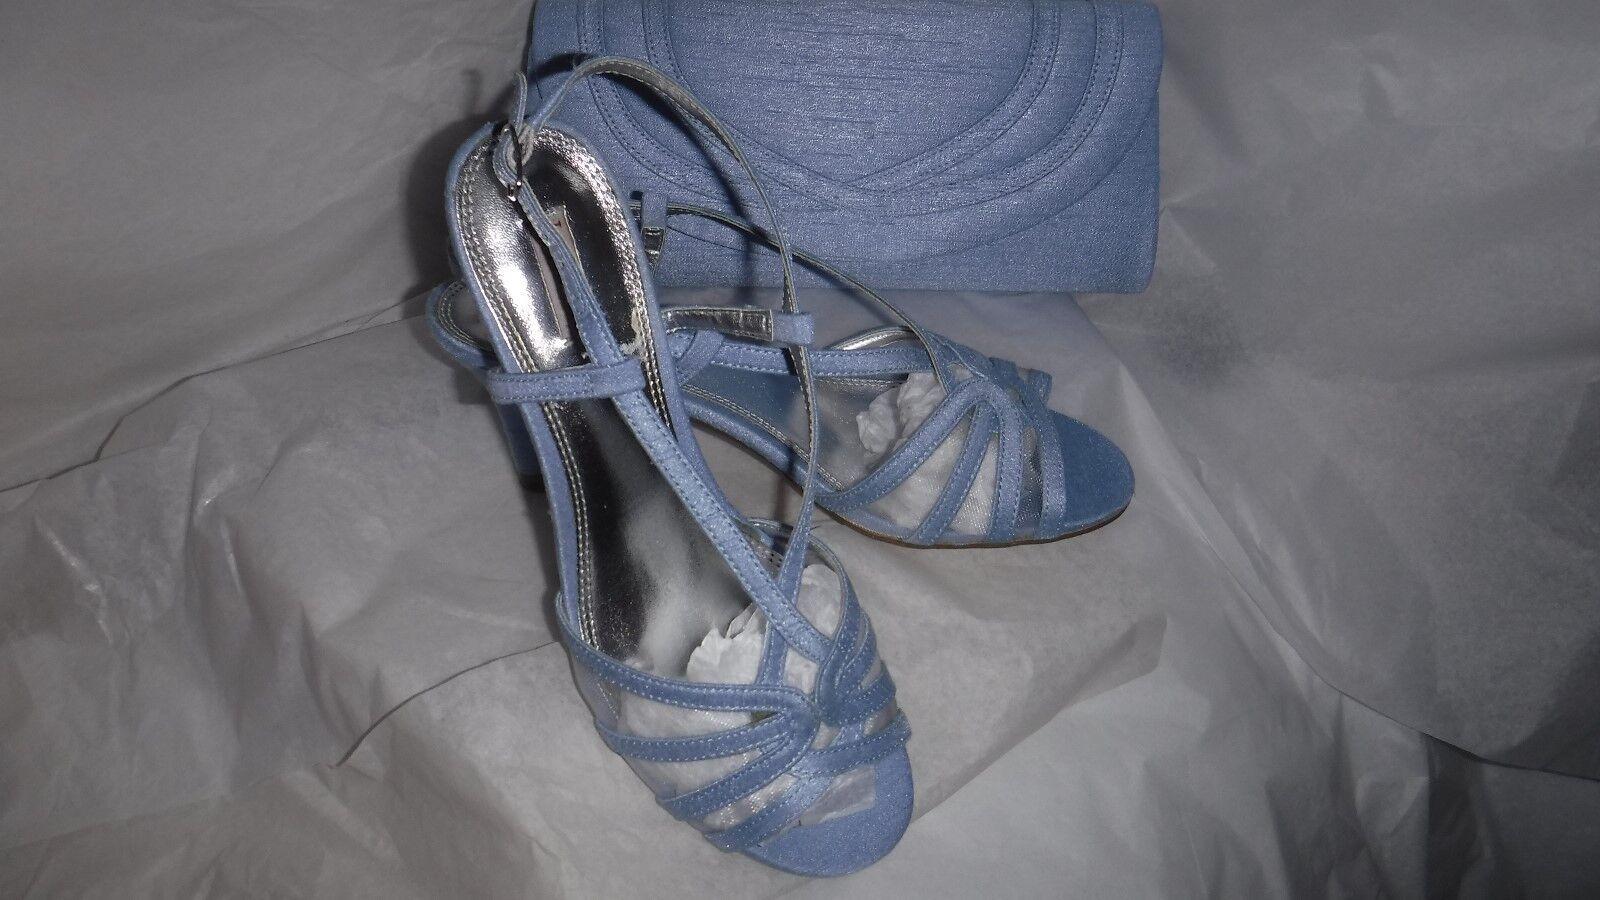 JACQUES Vert Blu Chiaro Scarpe con cinturino 4.5 EU 37 (4) probabilmente 4.5 cinturino & borsa abbinata 911493